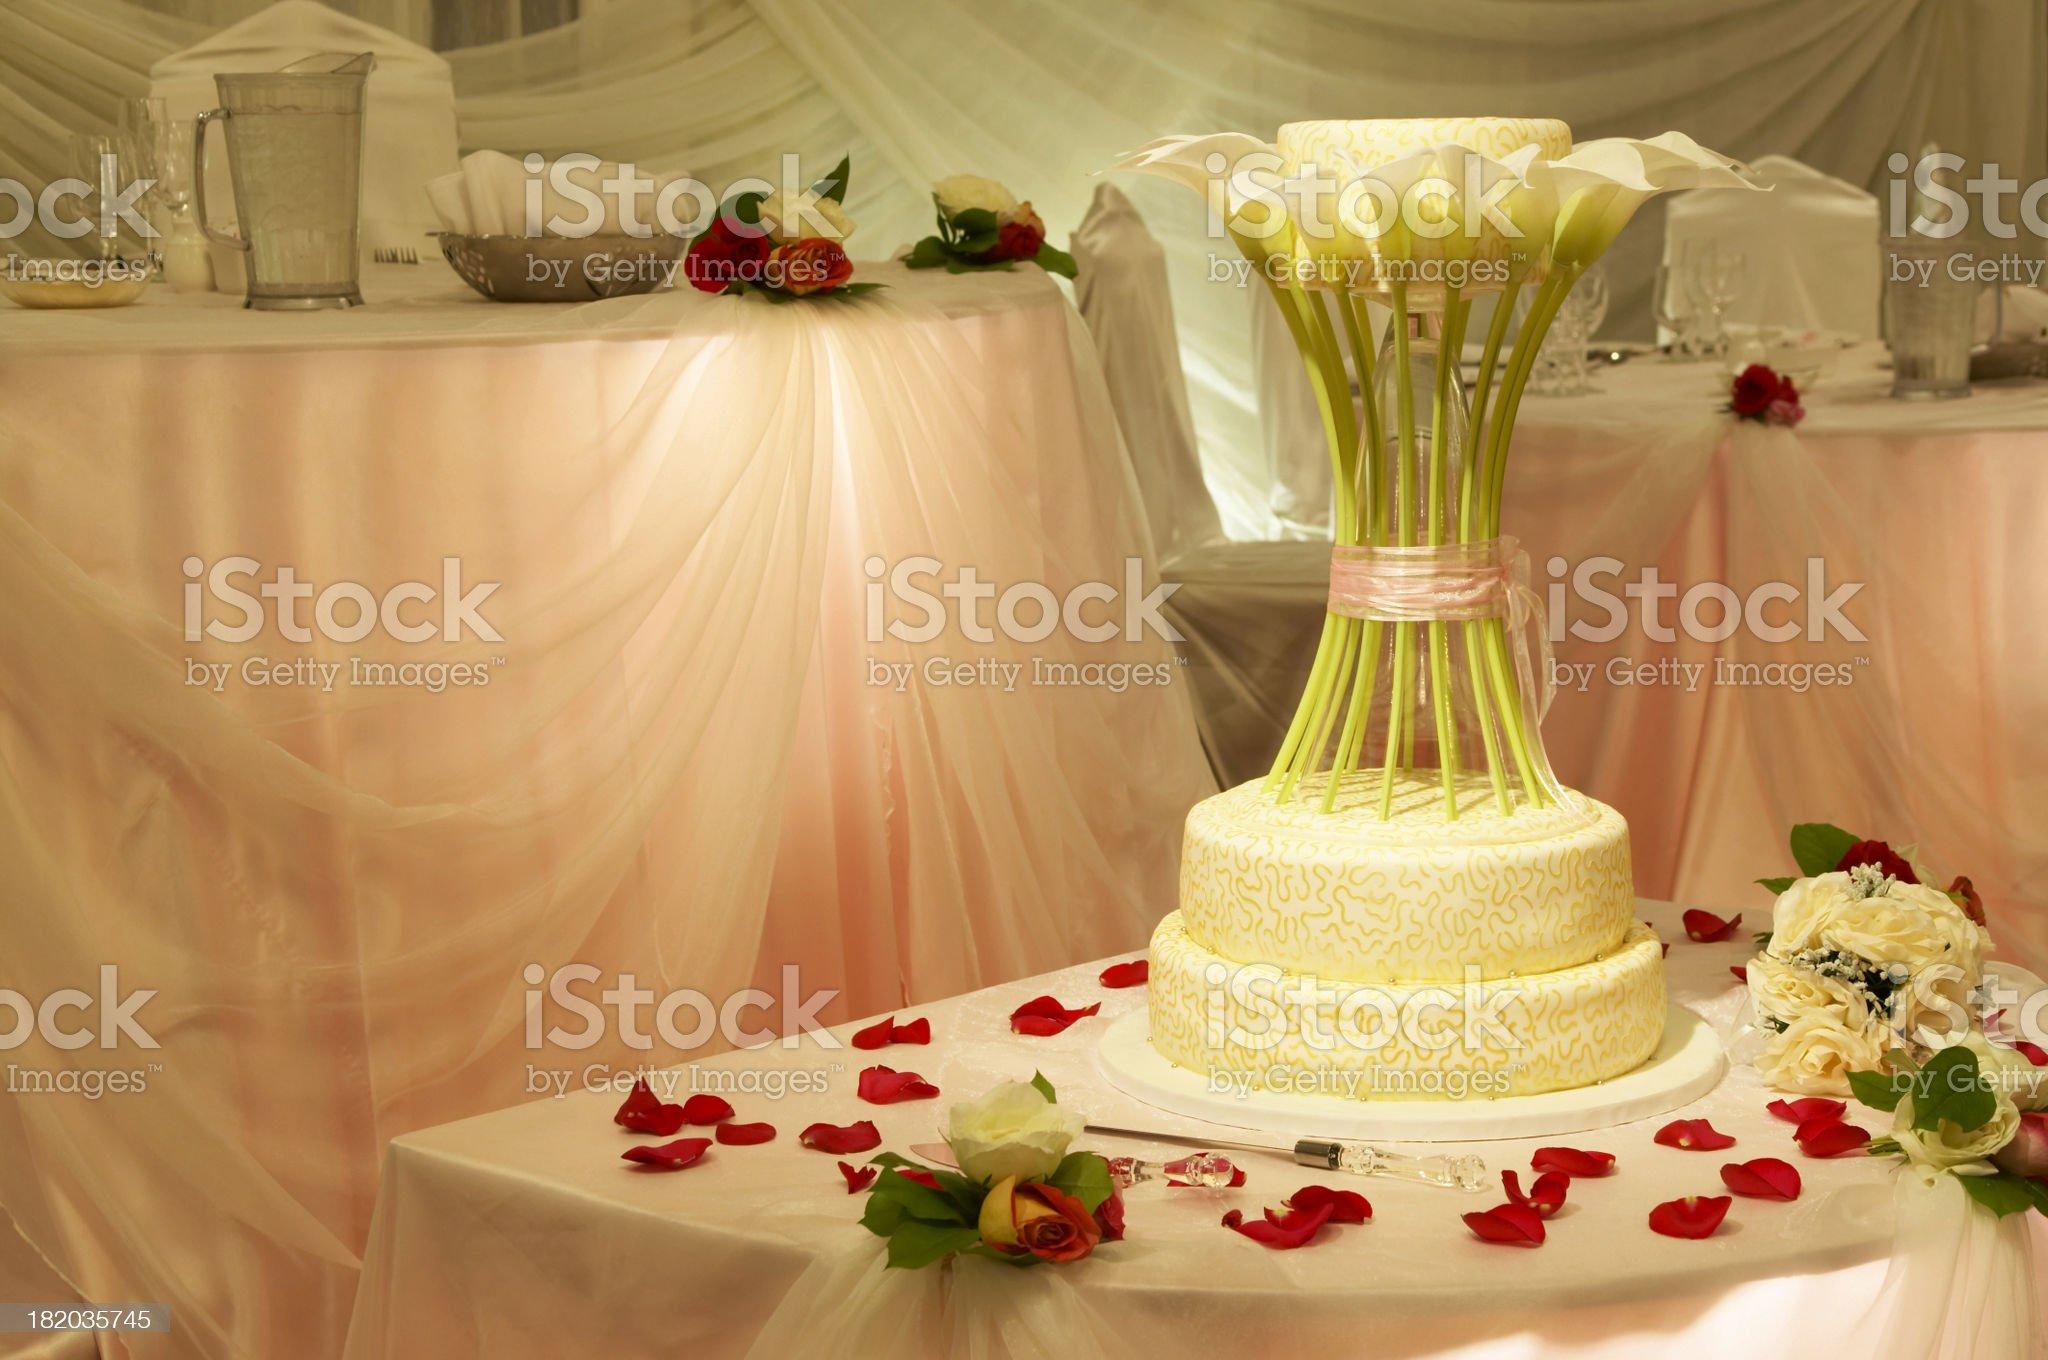 Wedding Delight Cake royalty-free stock photo